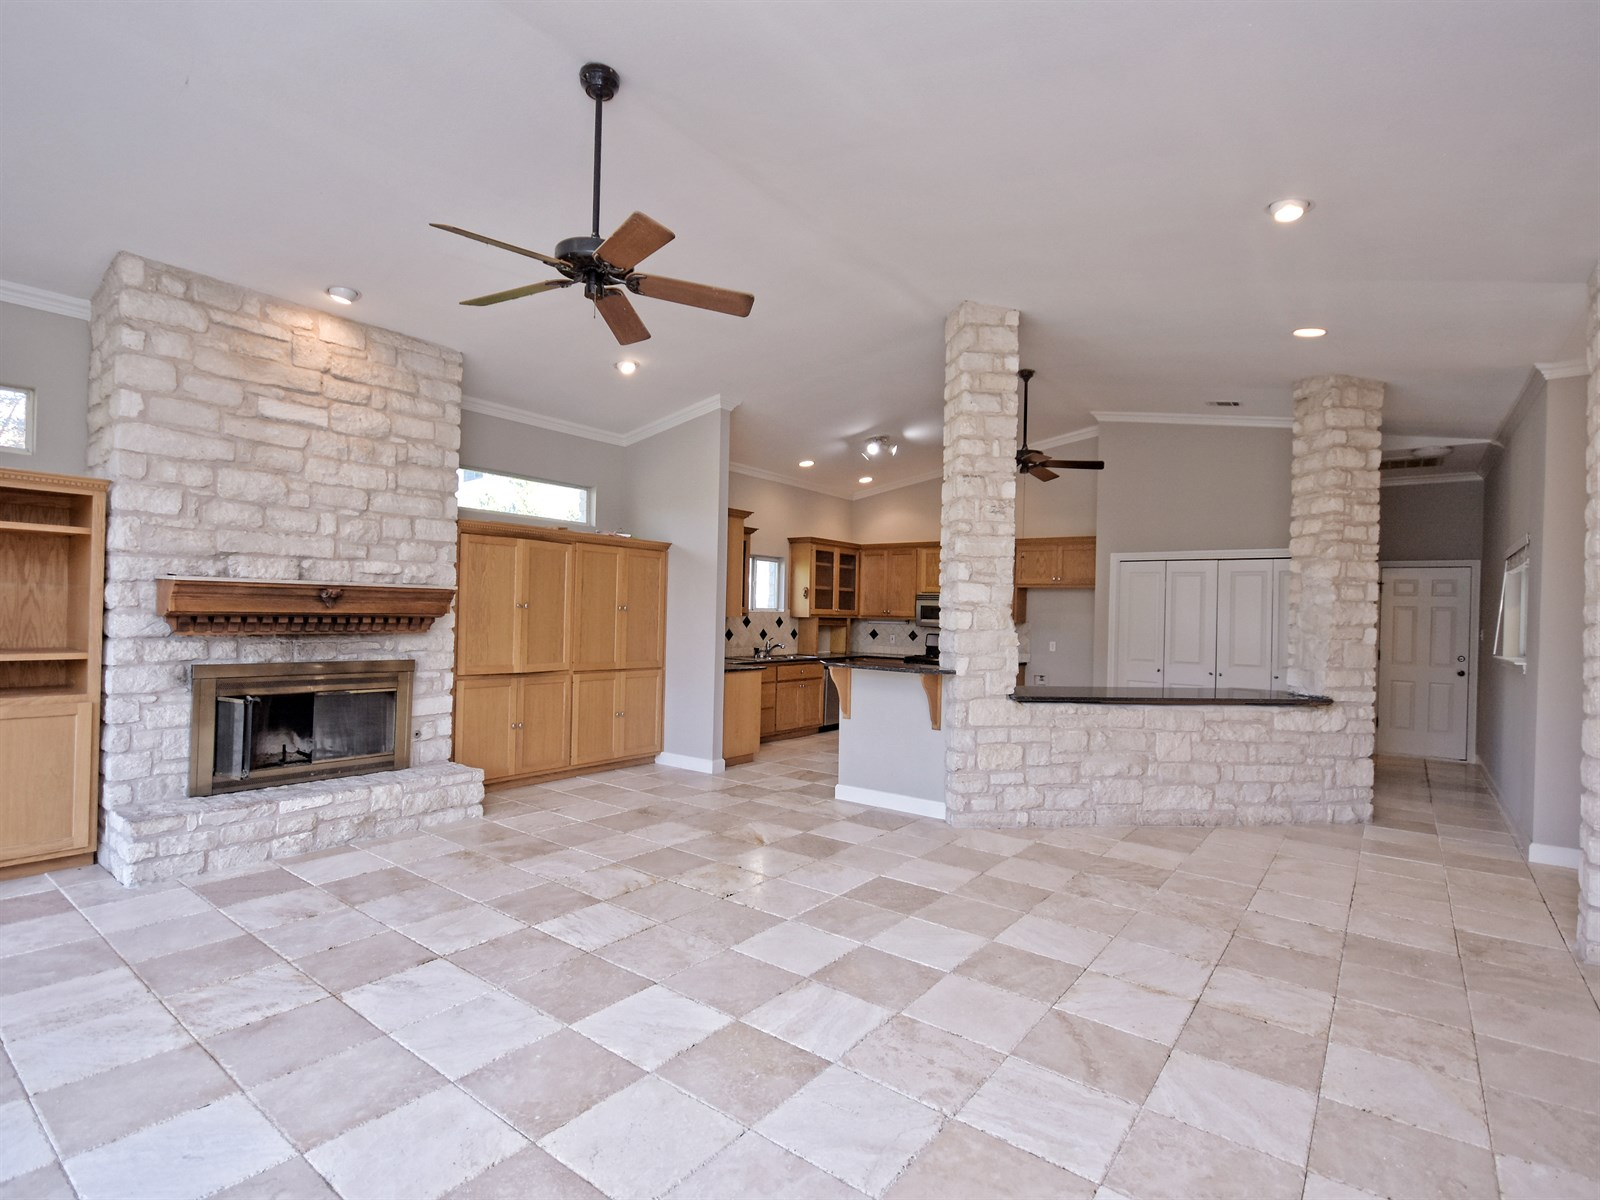 708 Bermuda Dr Lakeway TX   Lakeway Home for Sale   Lori Wakefield REALTOR   Keller Williams Lake Travis